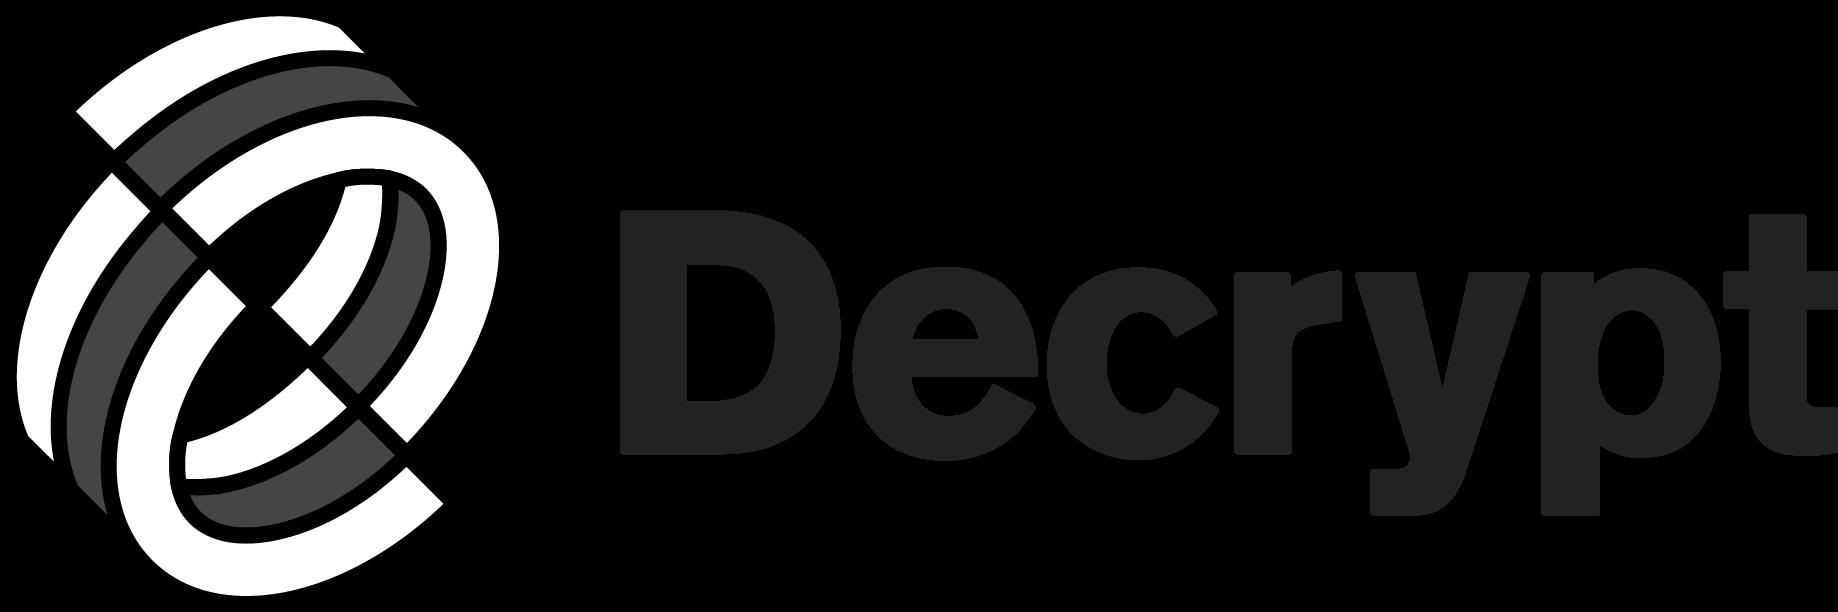 Decrypt